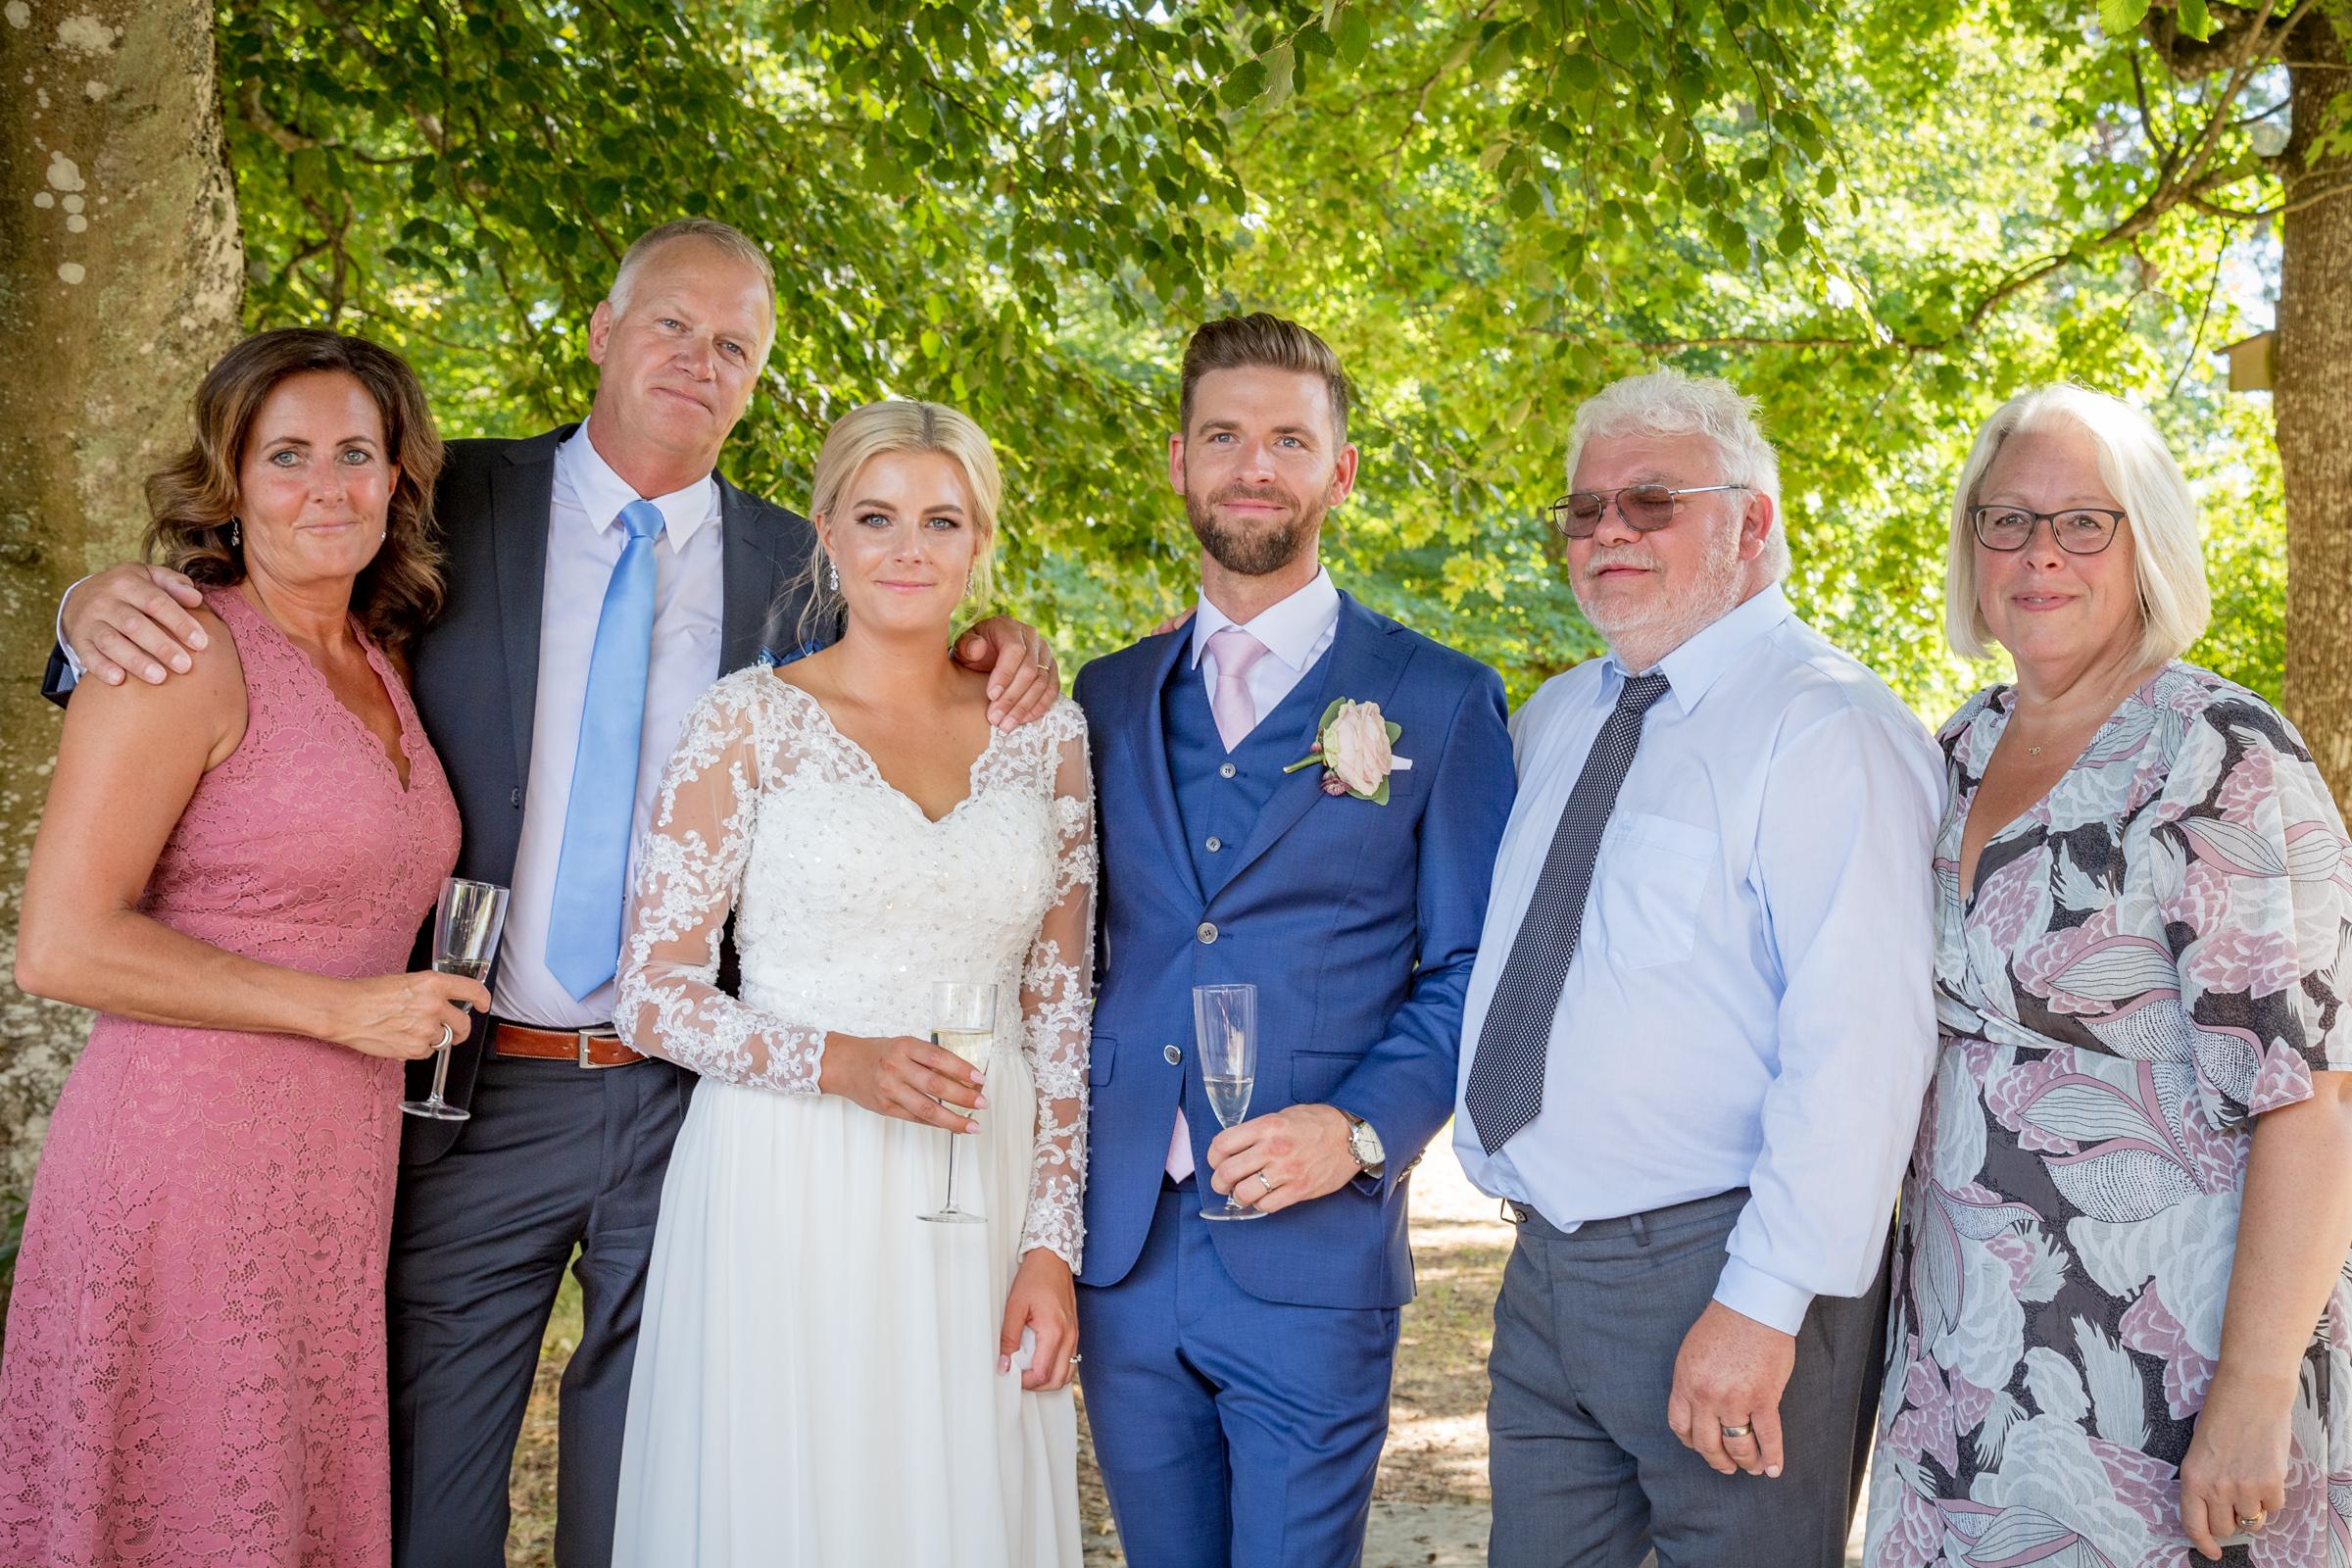 20180714-örebro-bröllop-864.jpg